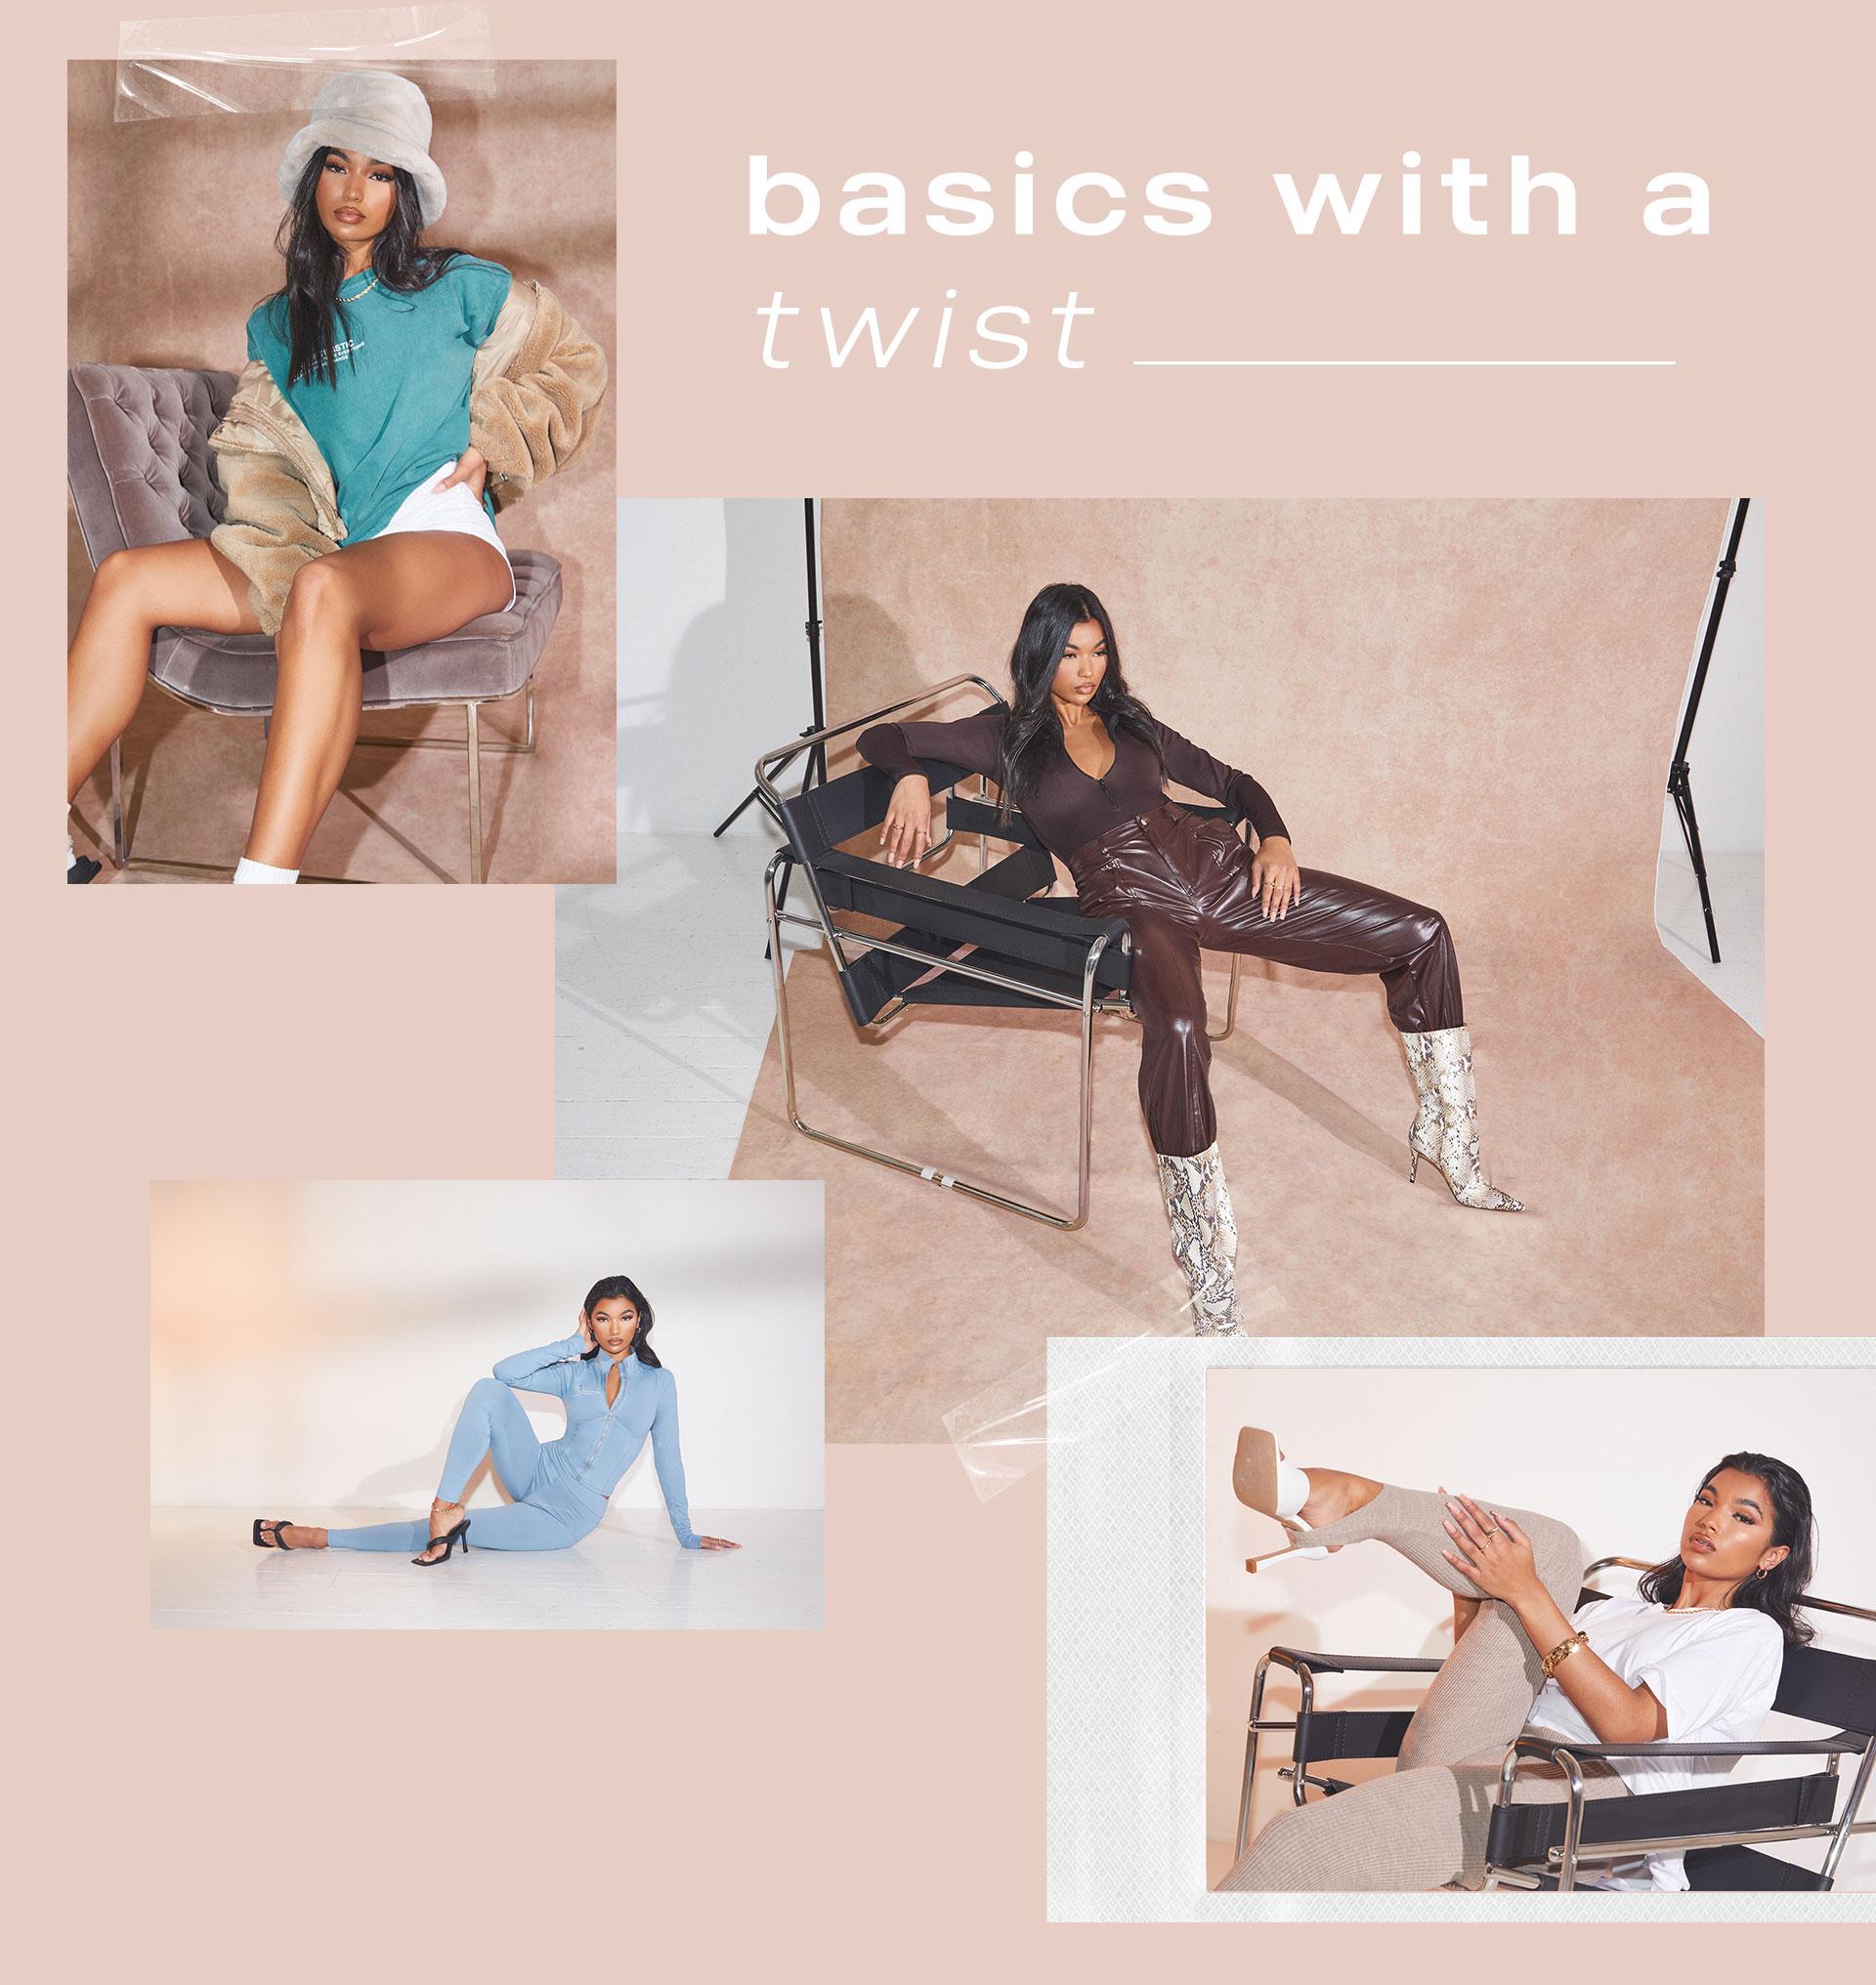 Basics with a twist